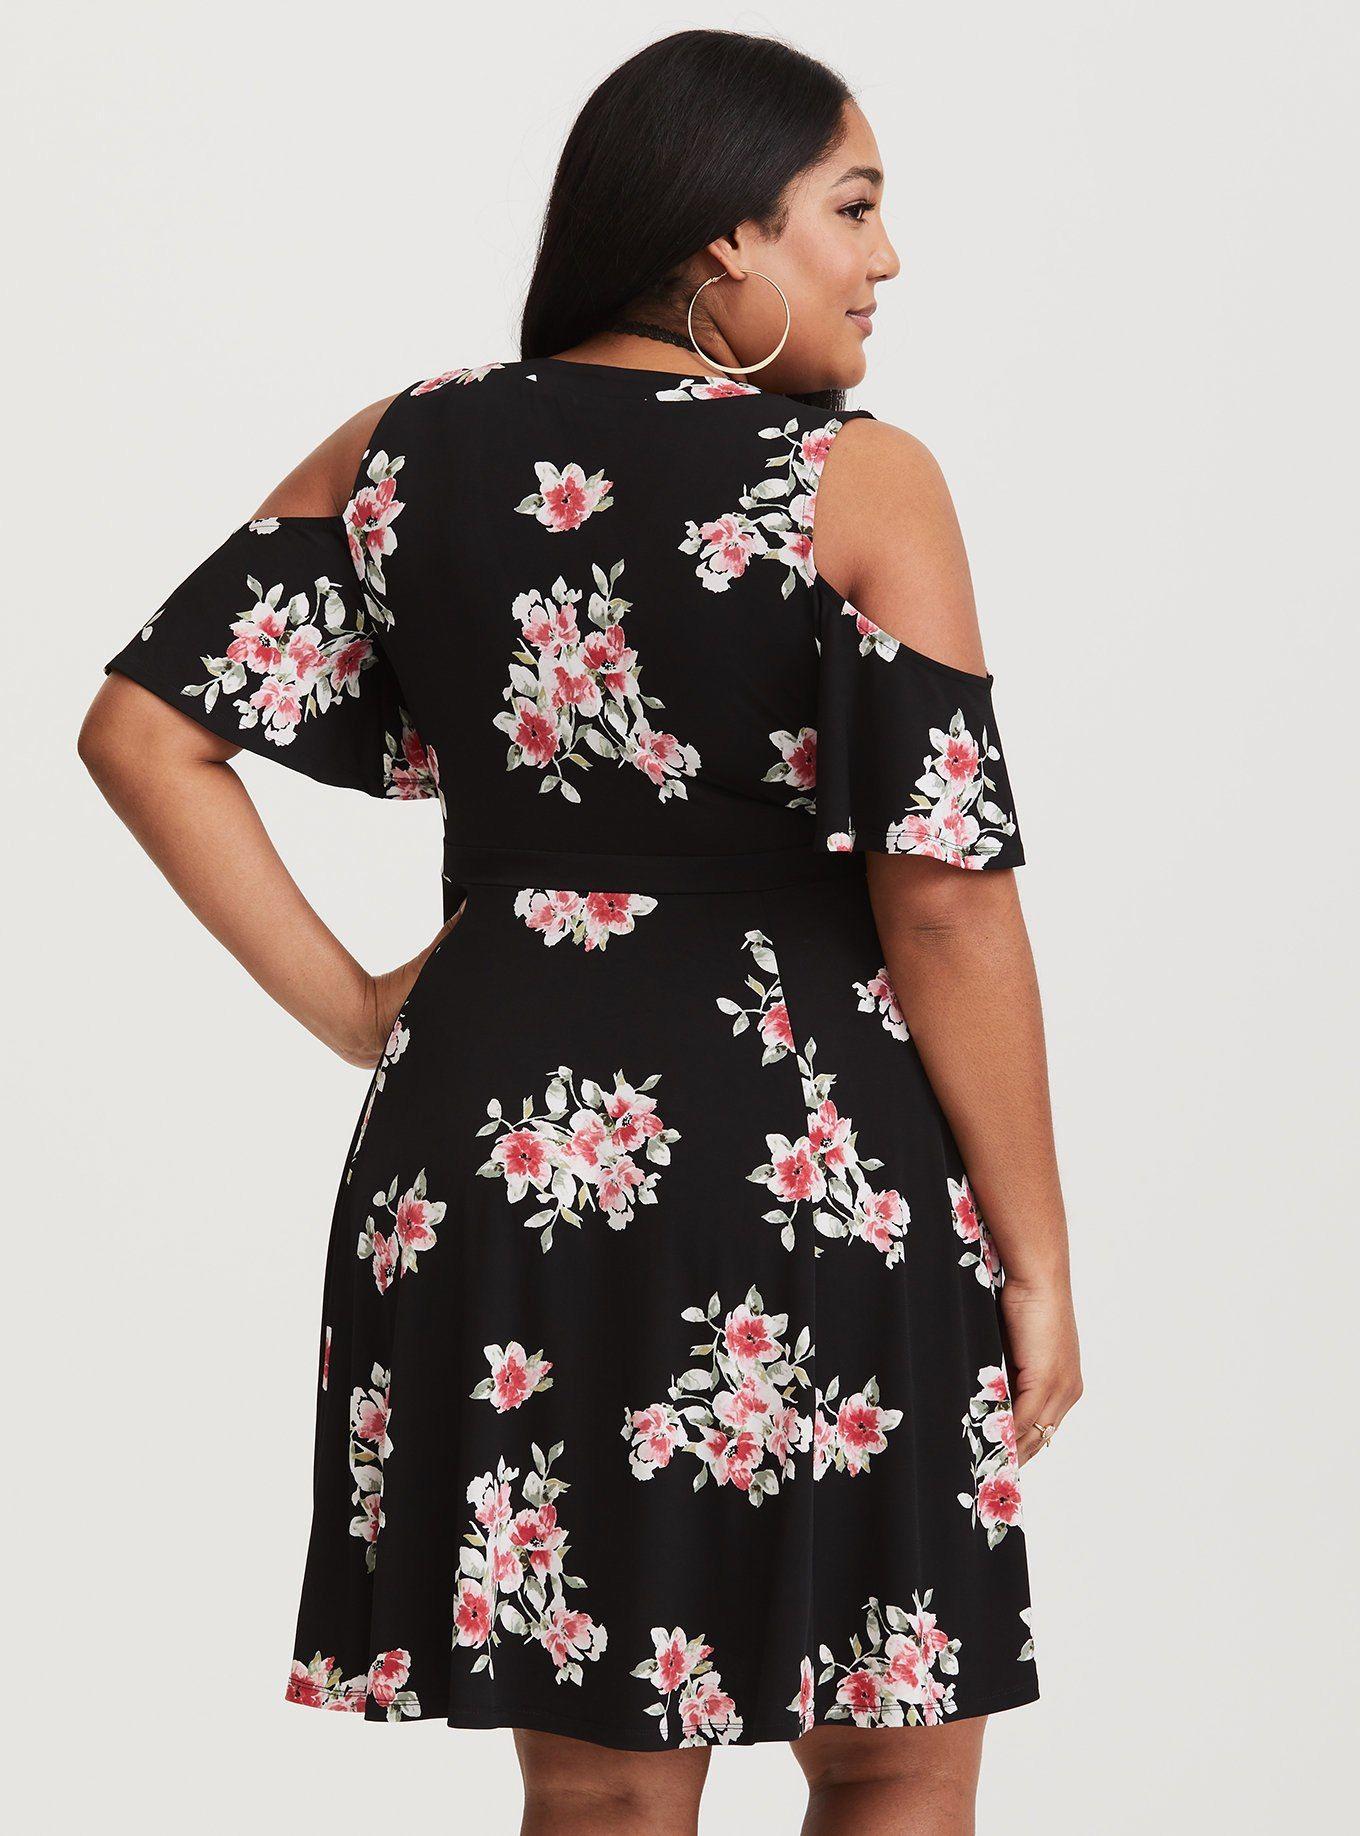 72e6cf67c10 Black Floral Jersey Knit Skater Dress